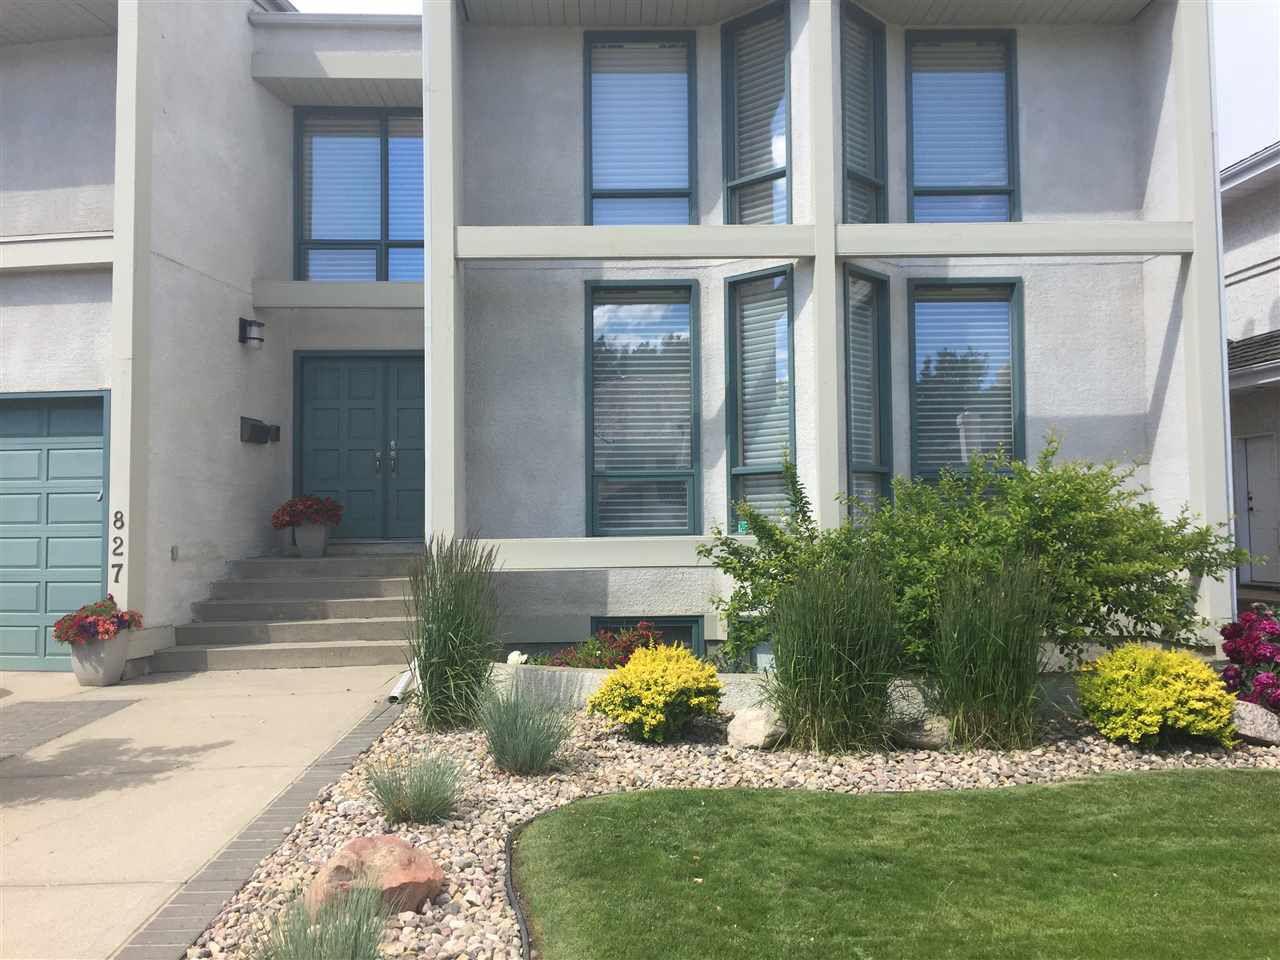 Photo 30: Photos: 827 WHEELER Road W in Edmonton: Zone 22 House for sale : MLS®# E4151881